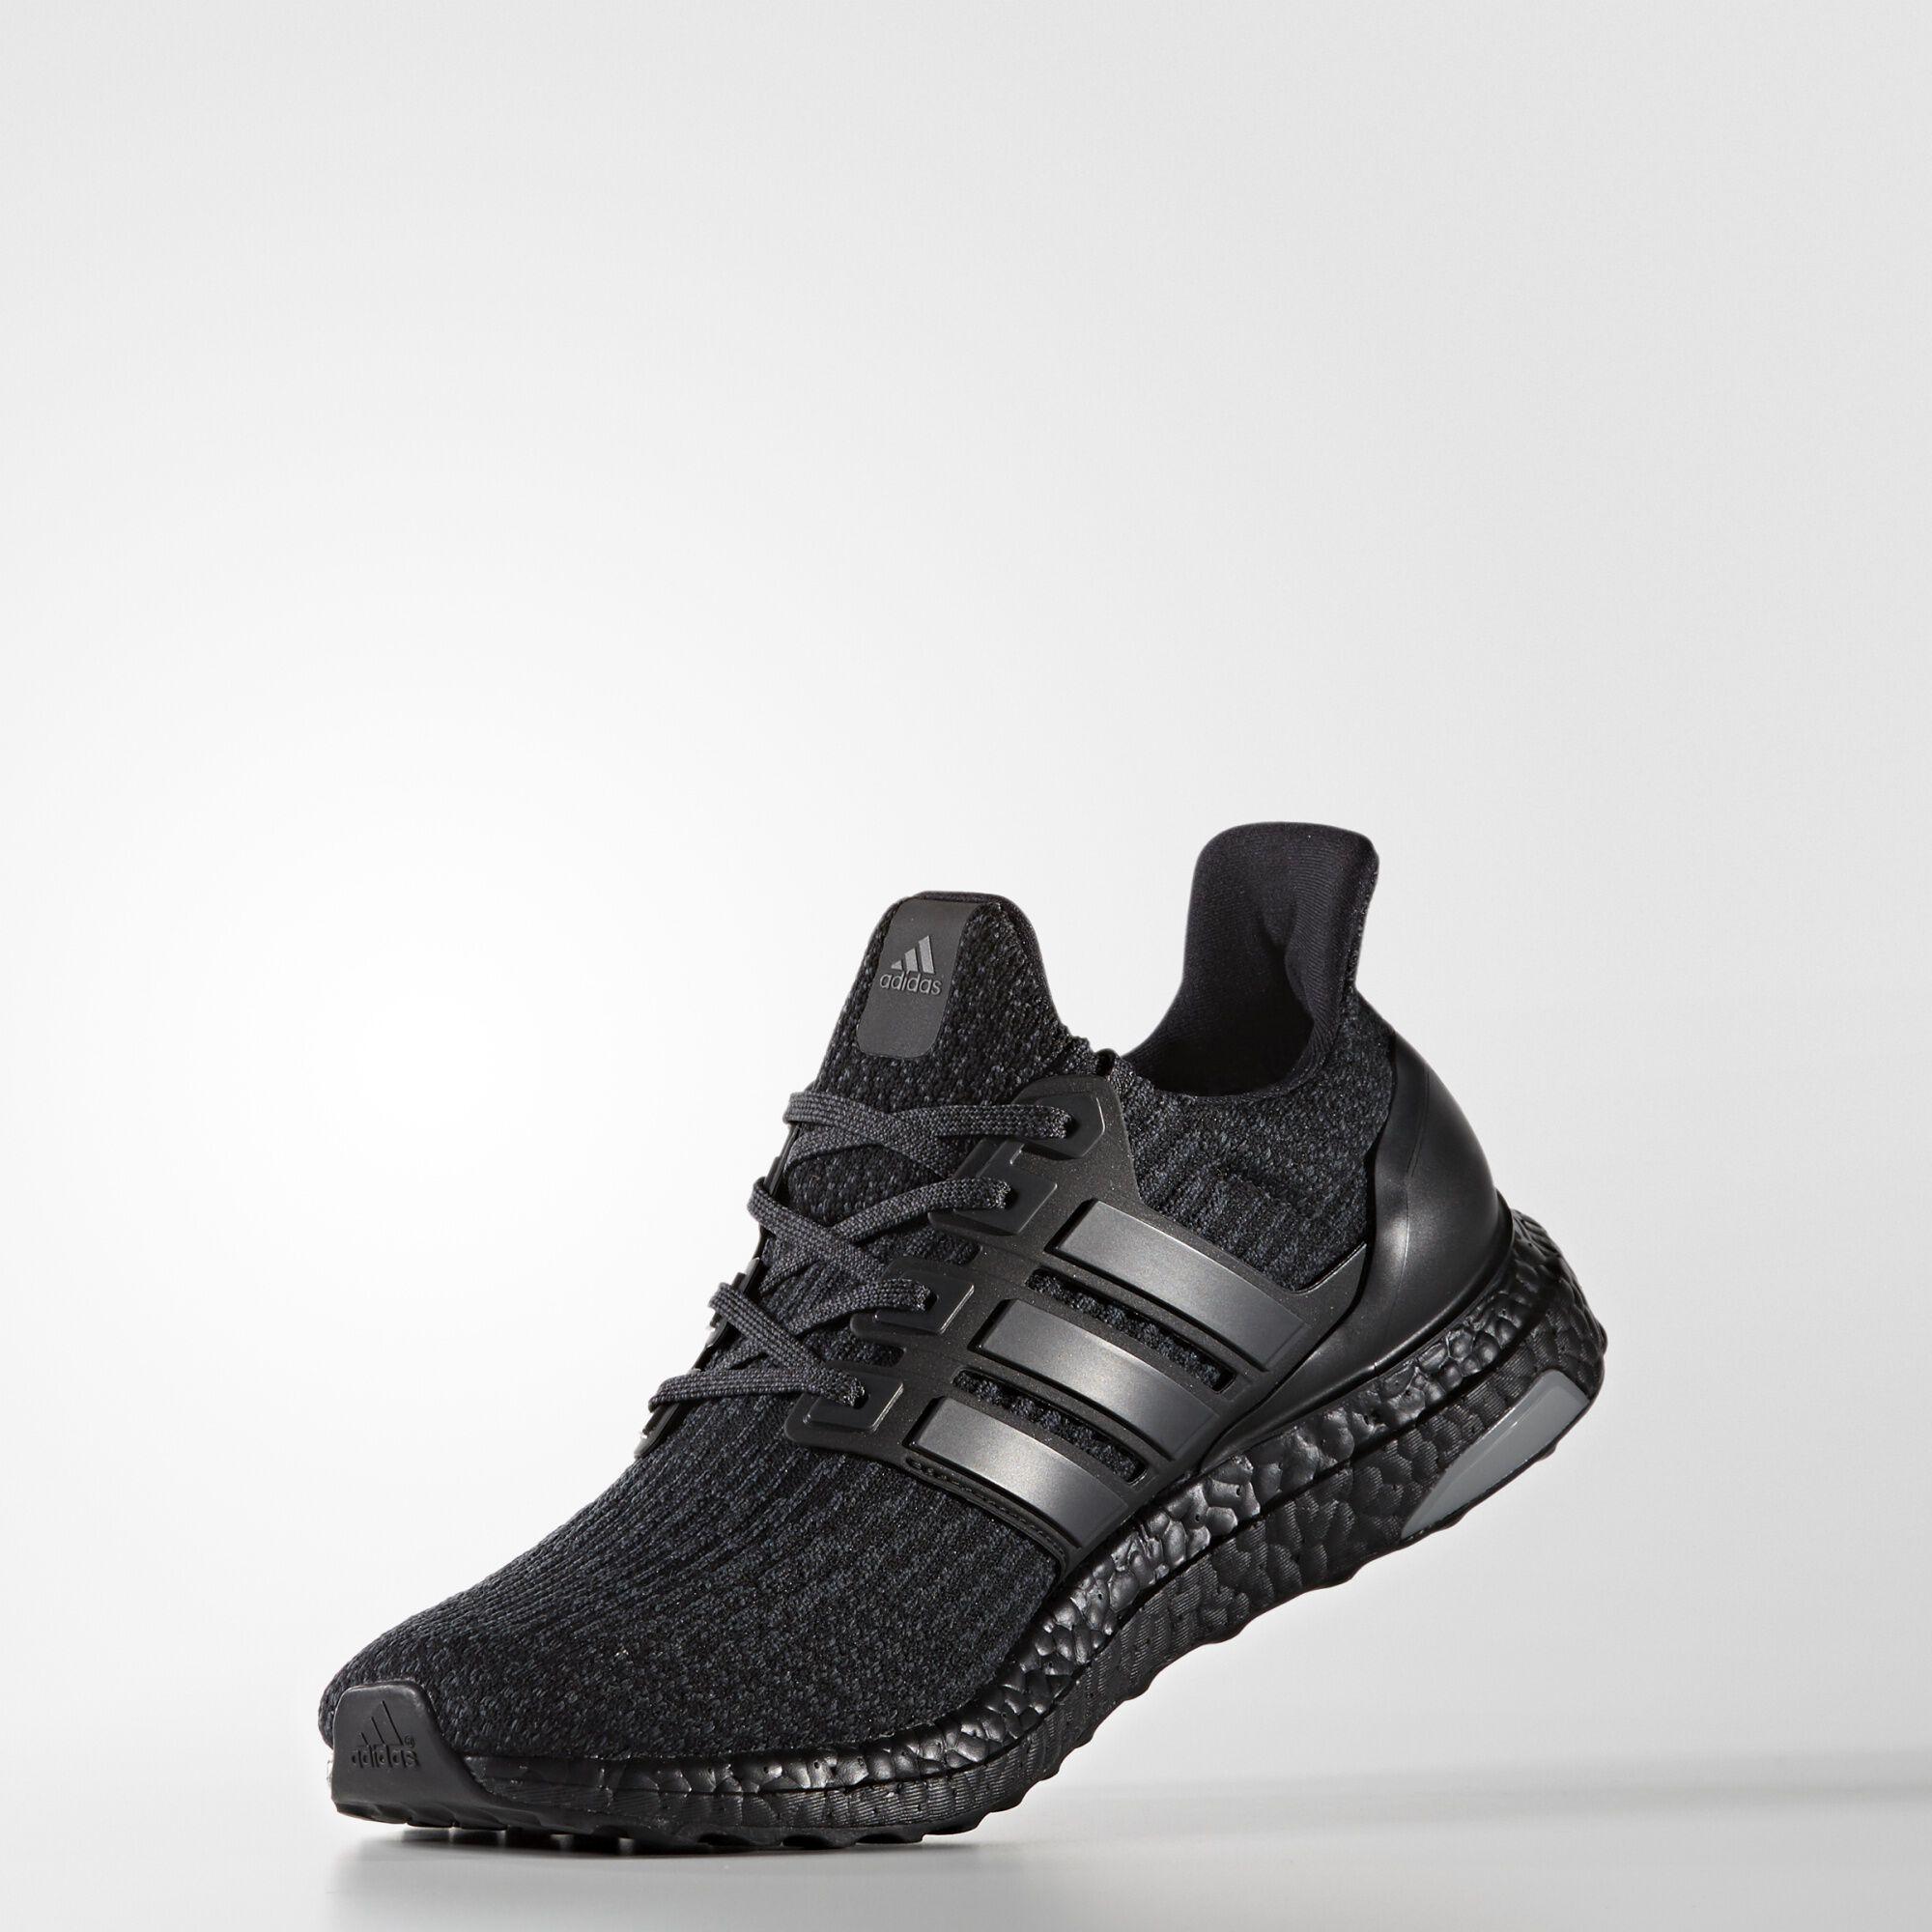 90ccb79a adidas: Ultra Boost 3.0 'Triple Black' CW: Core Black/Black/Black SKU:  BA8920 Release: 03.01.17. Retail: $200